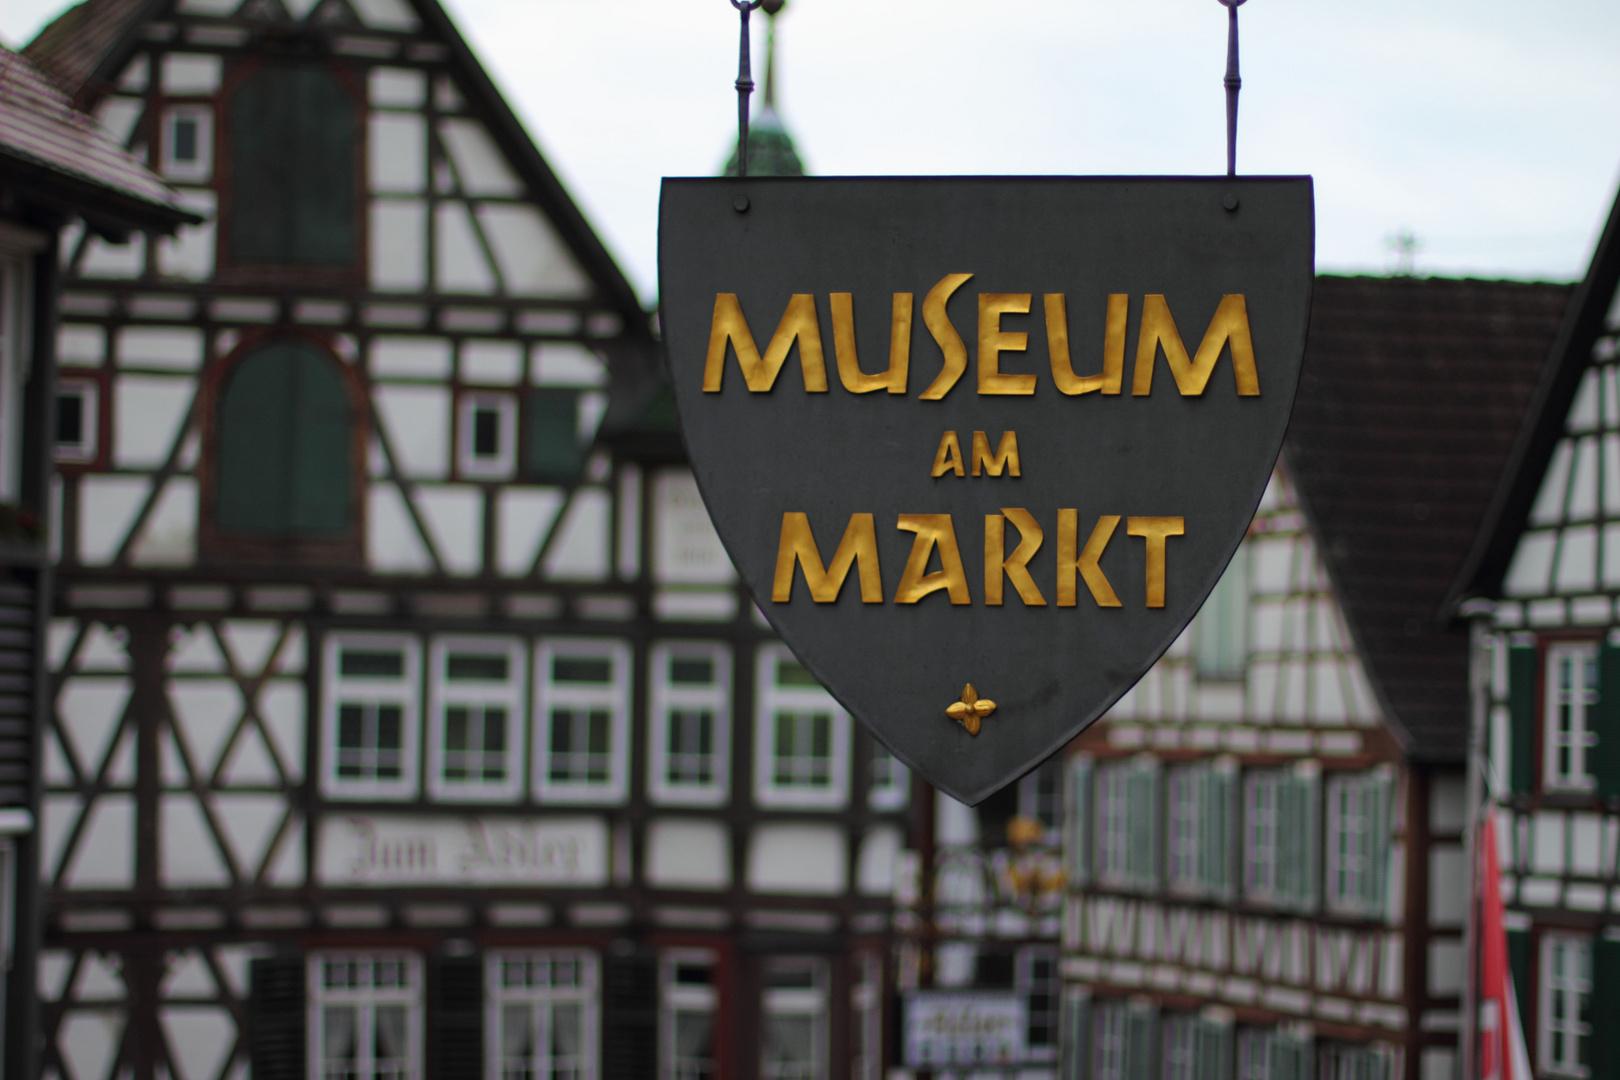 Museum am Markt